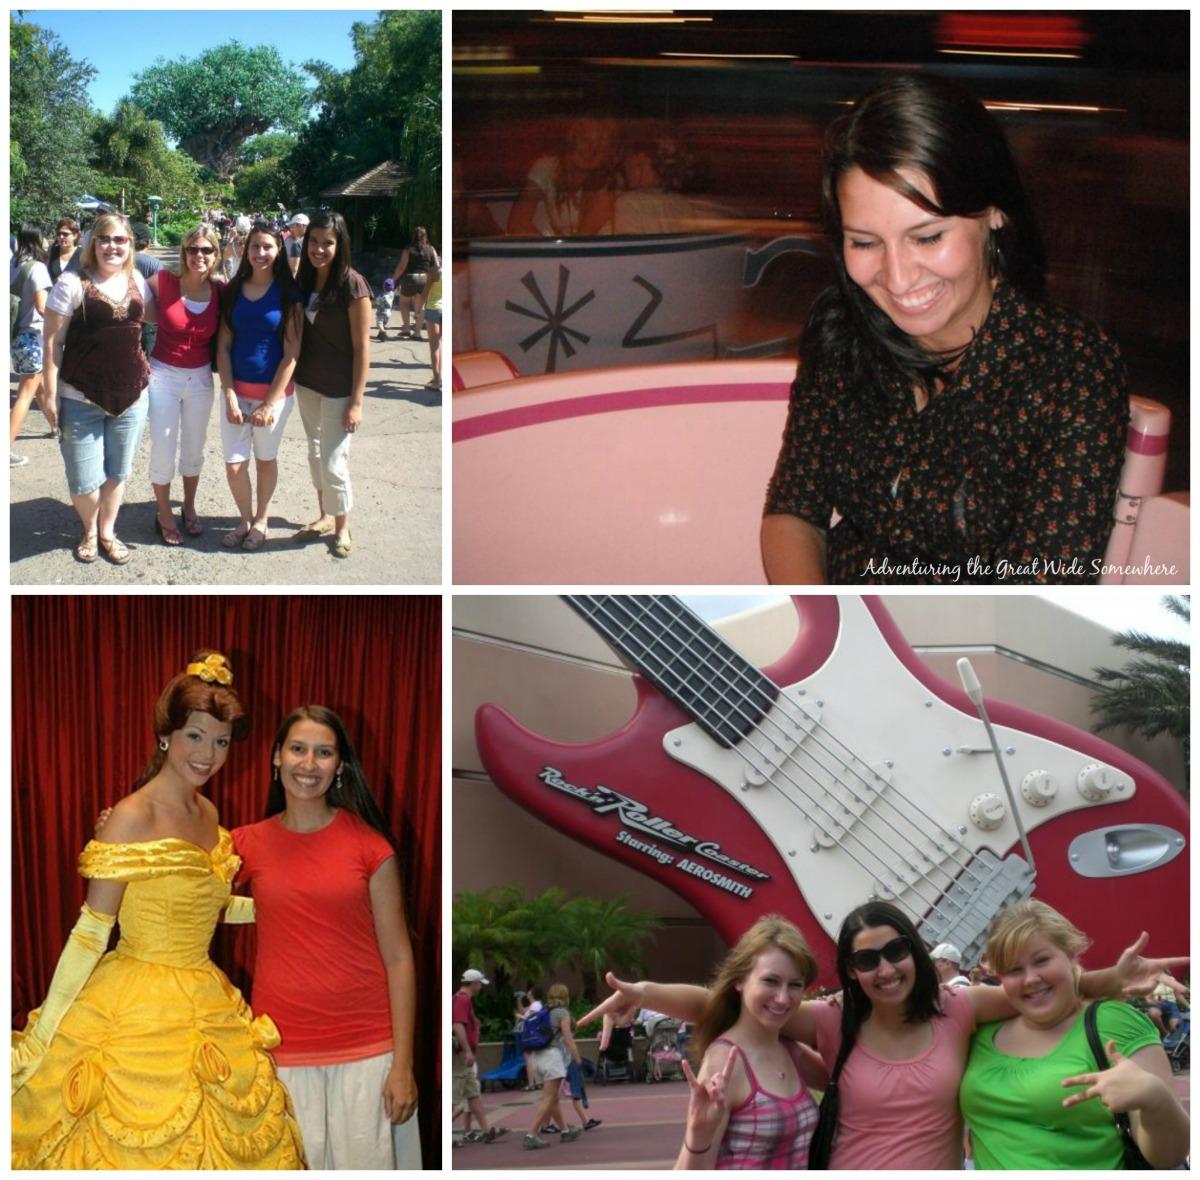 Adventuring the Early Days of Disney.jpg